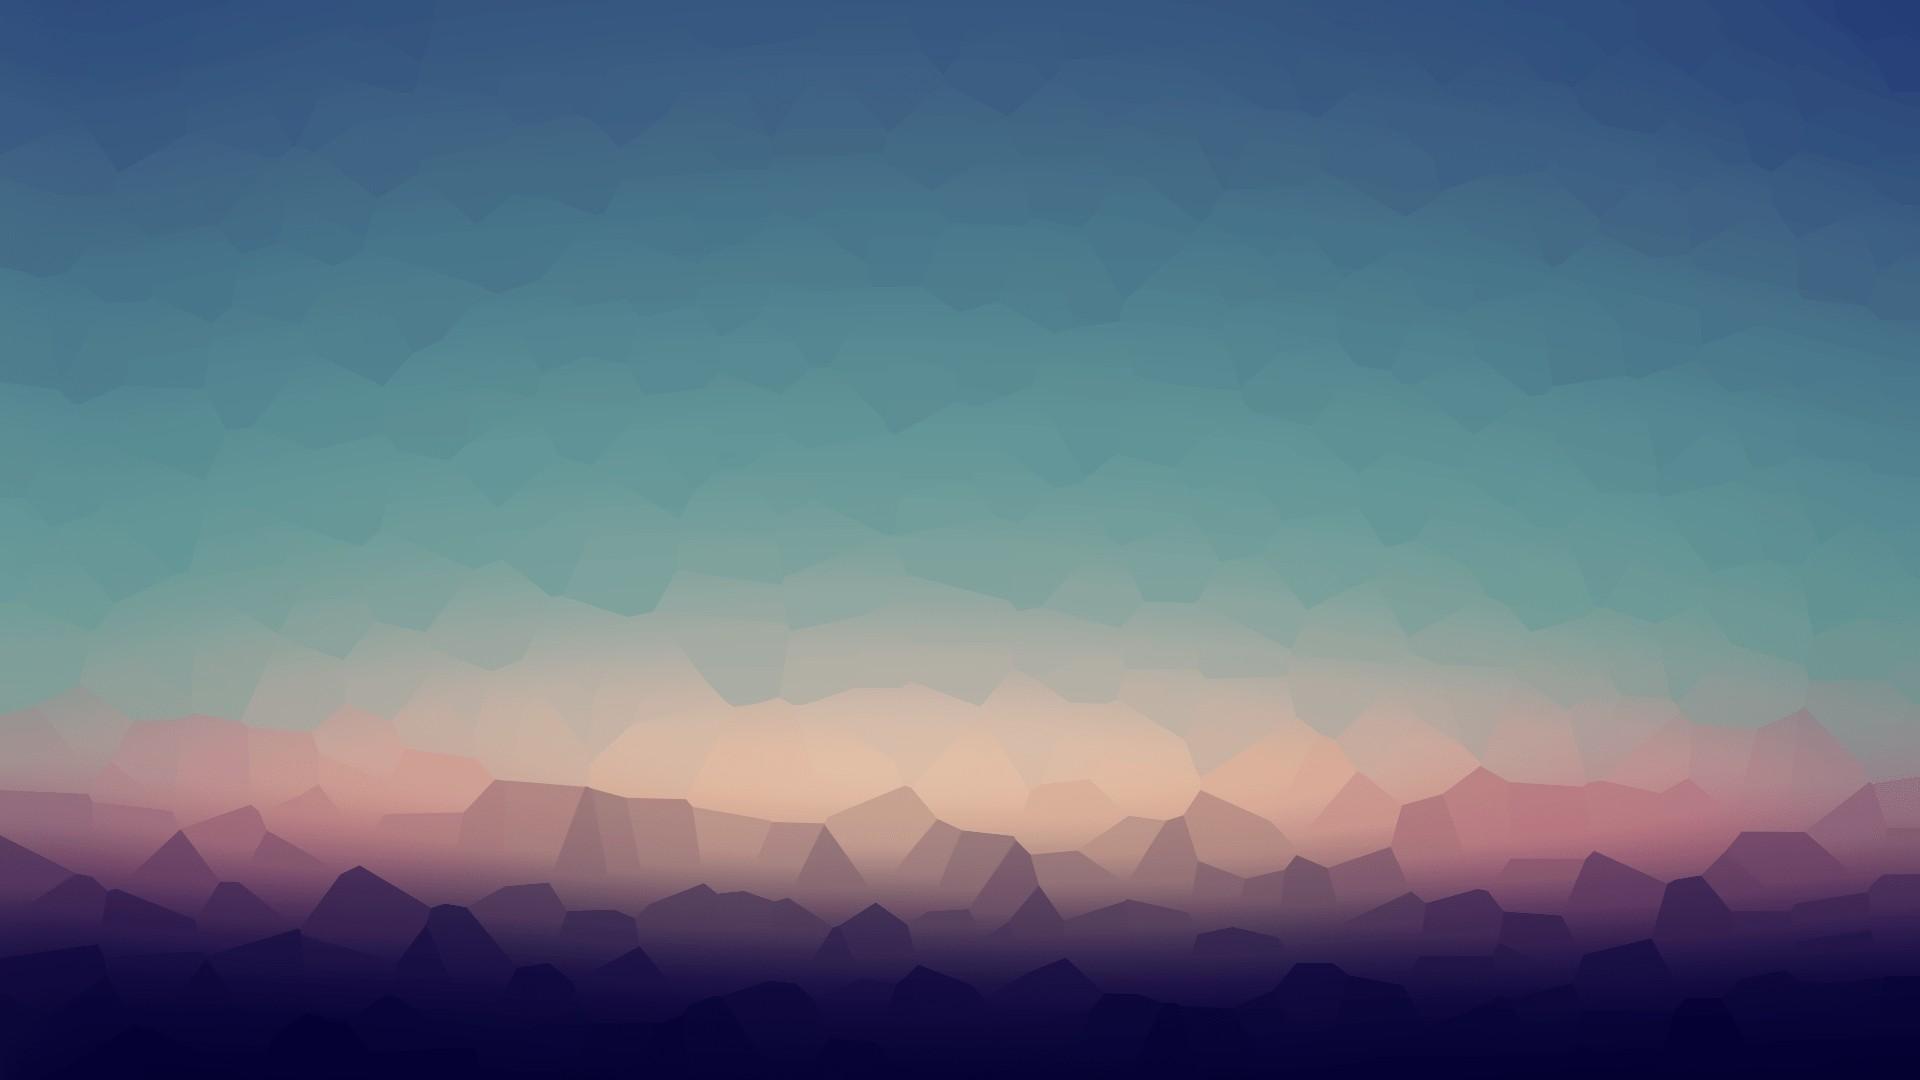 Basic PC Wallpaper